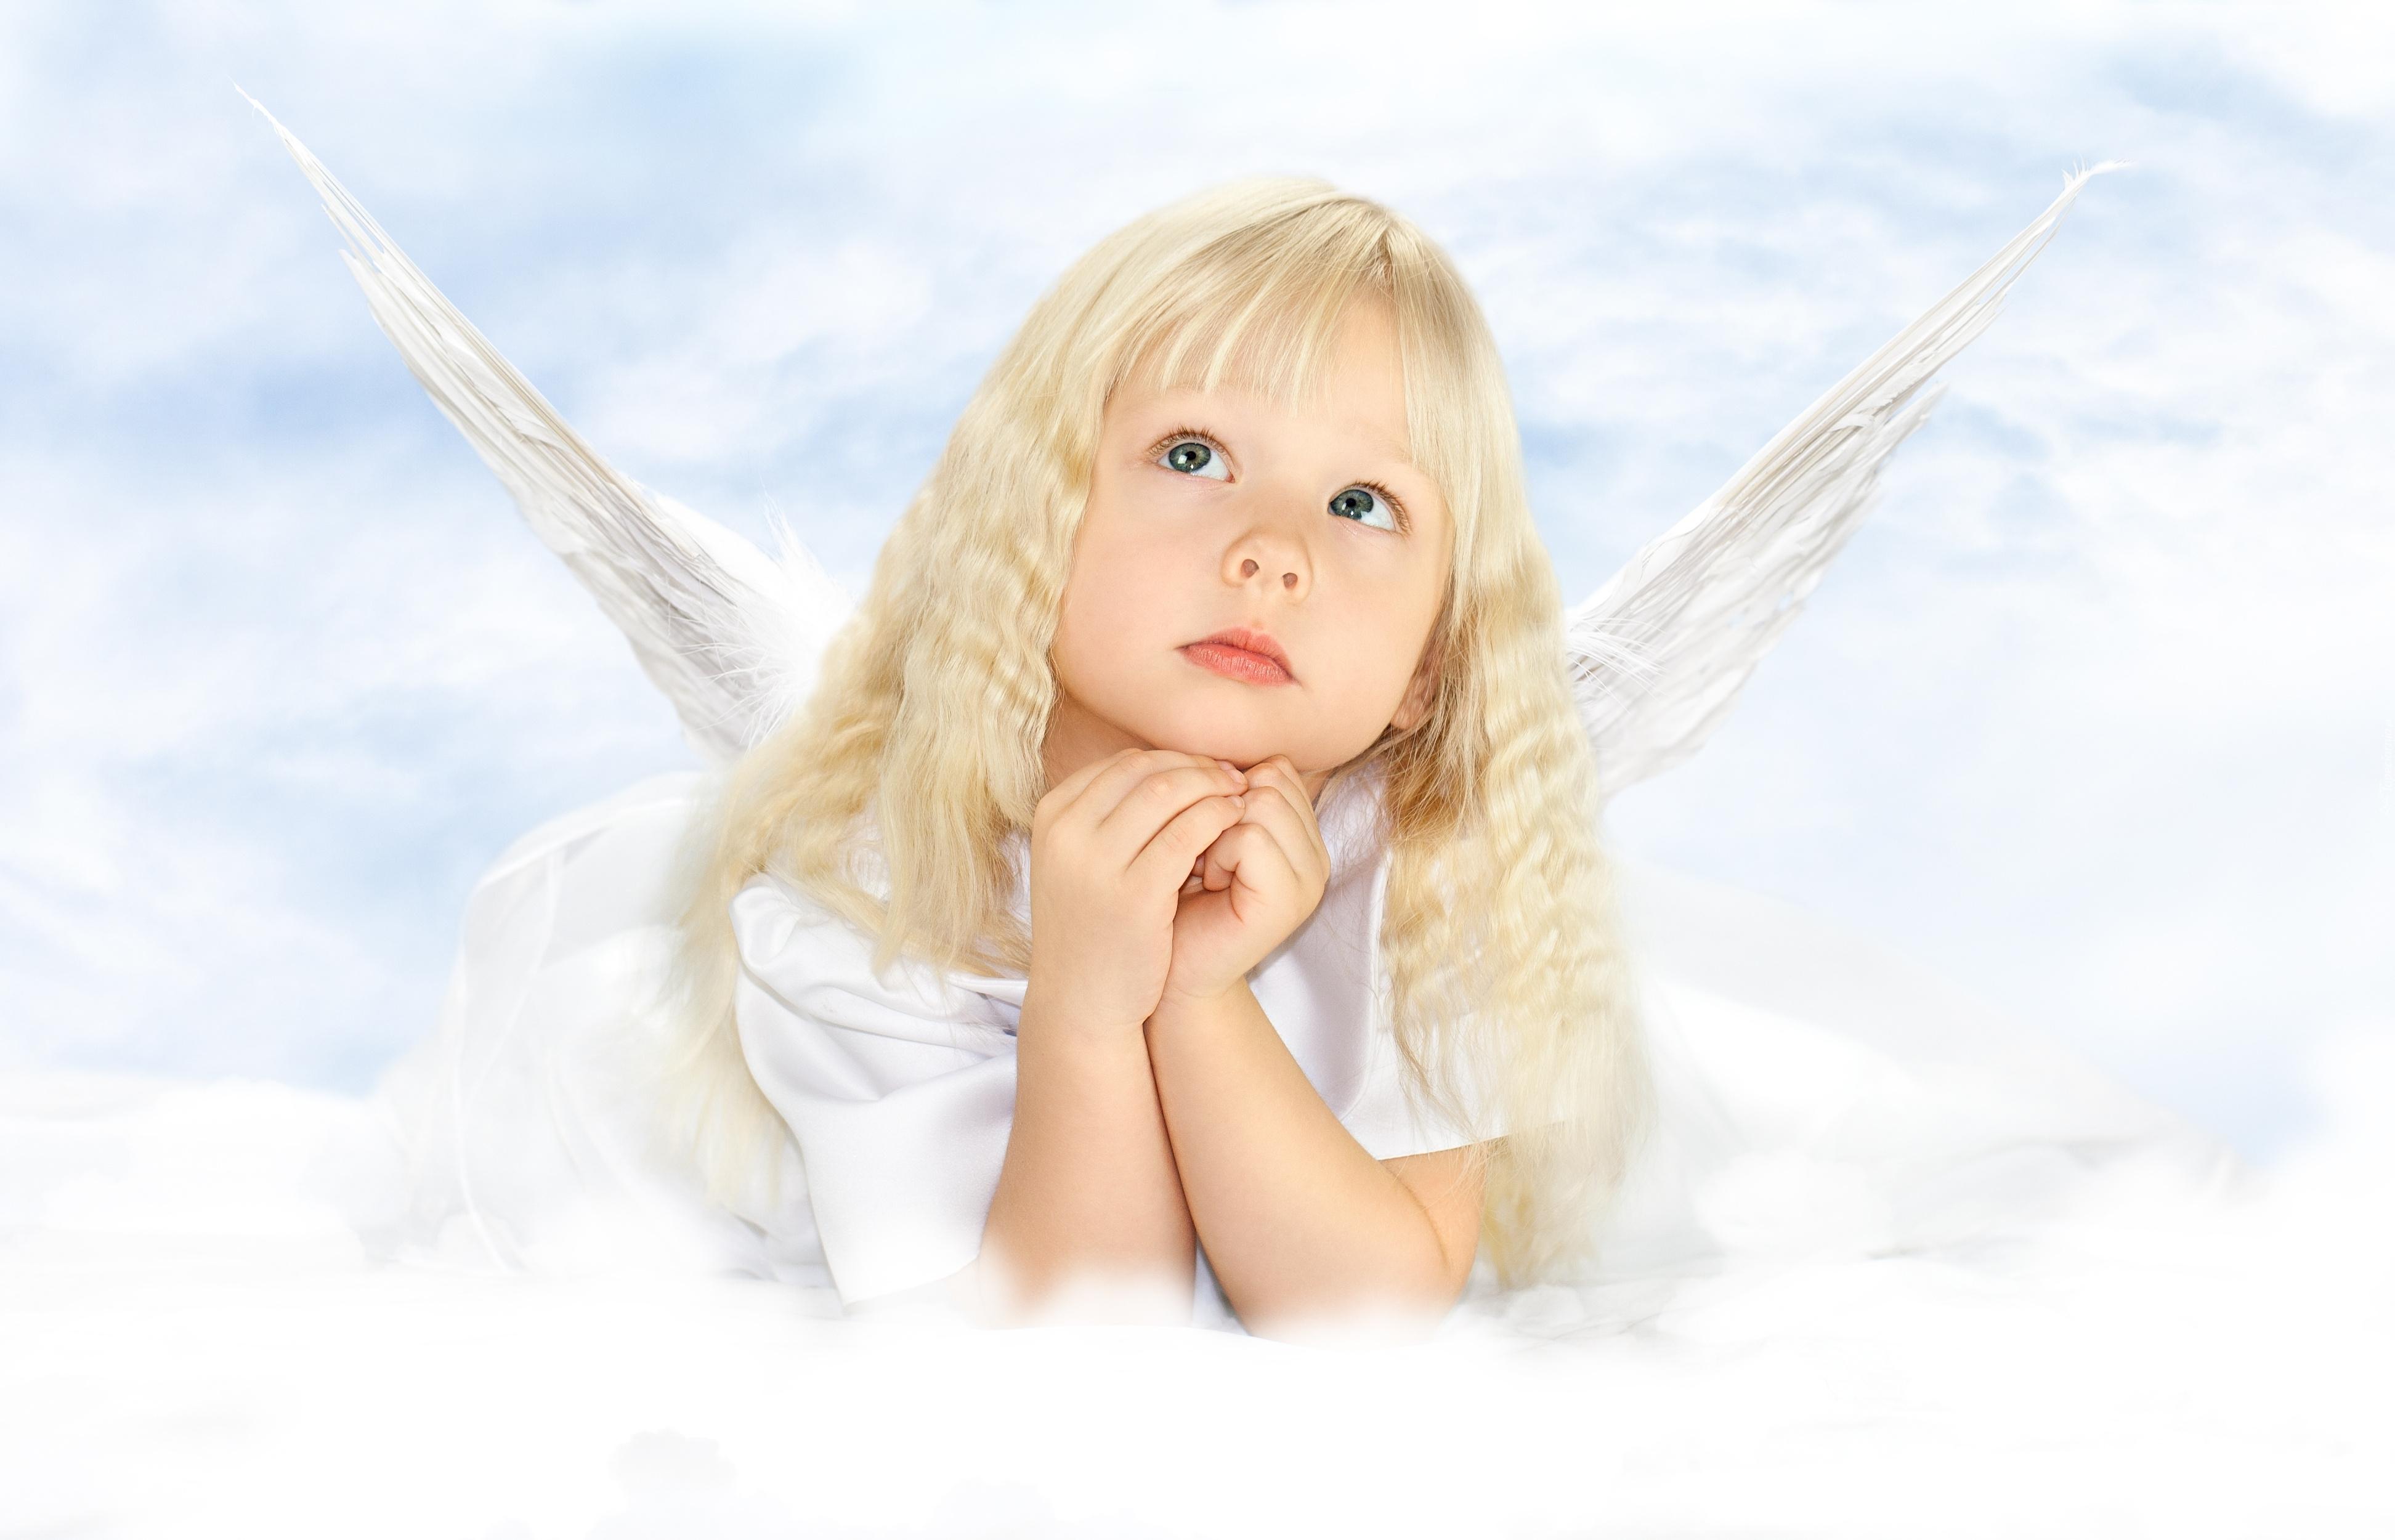 god's little angel - HD1920×1080